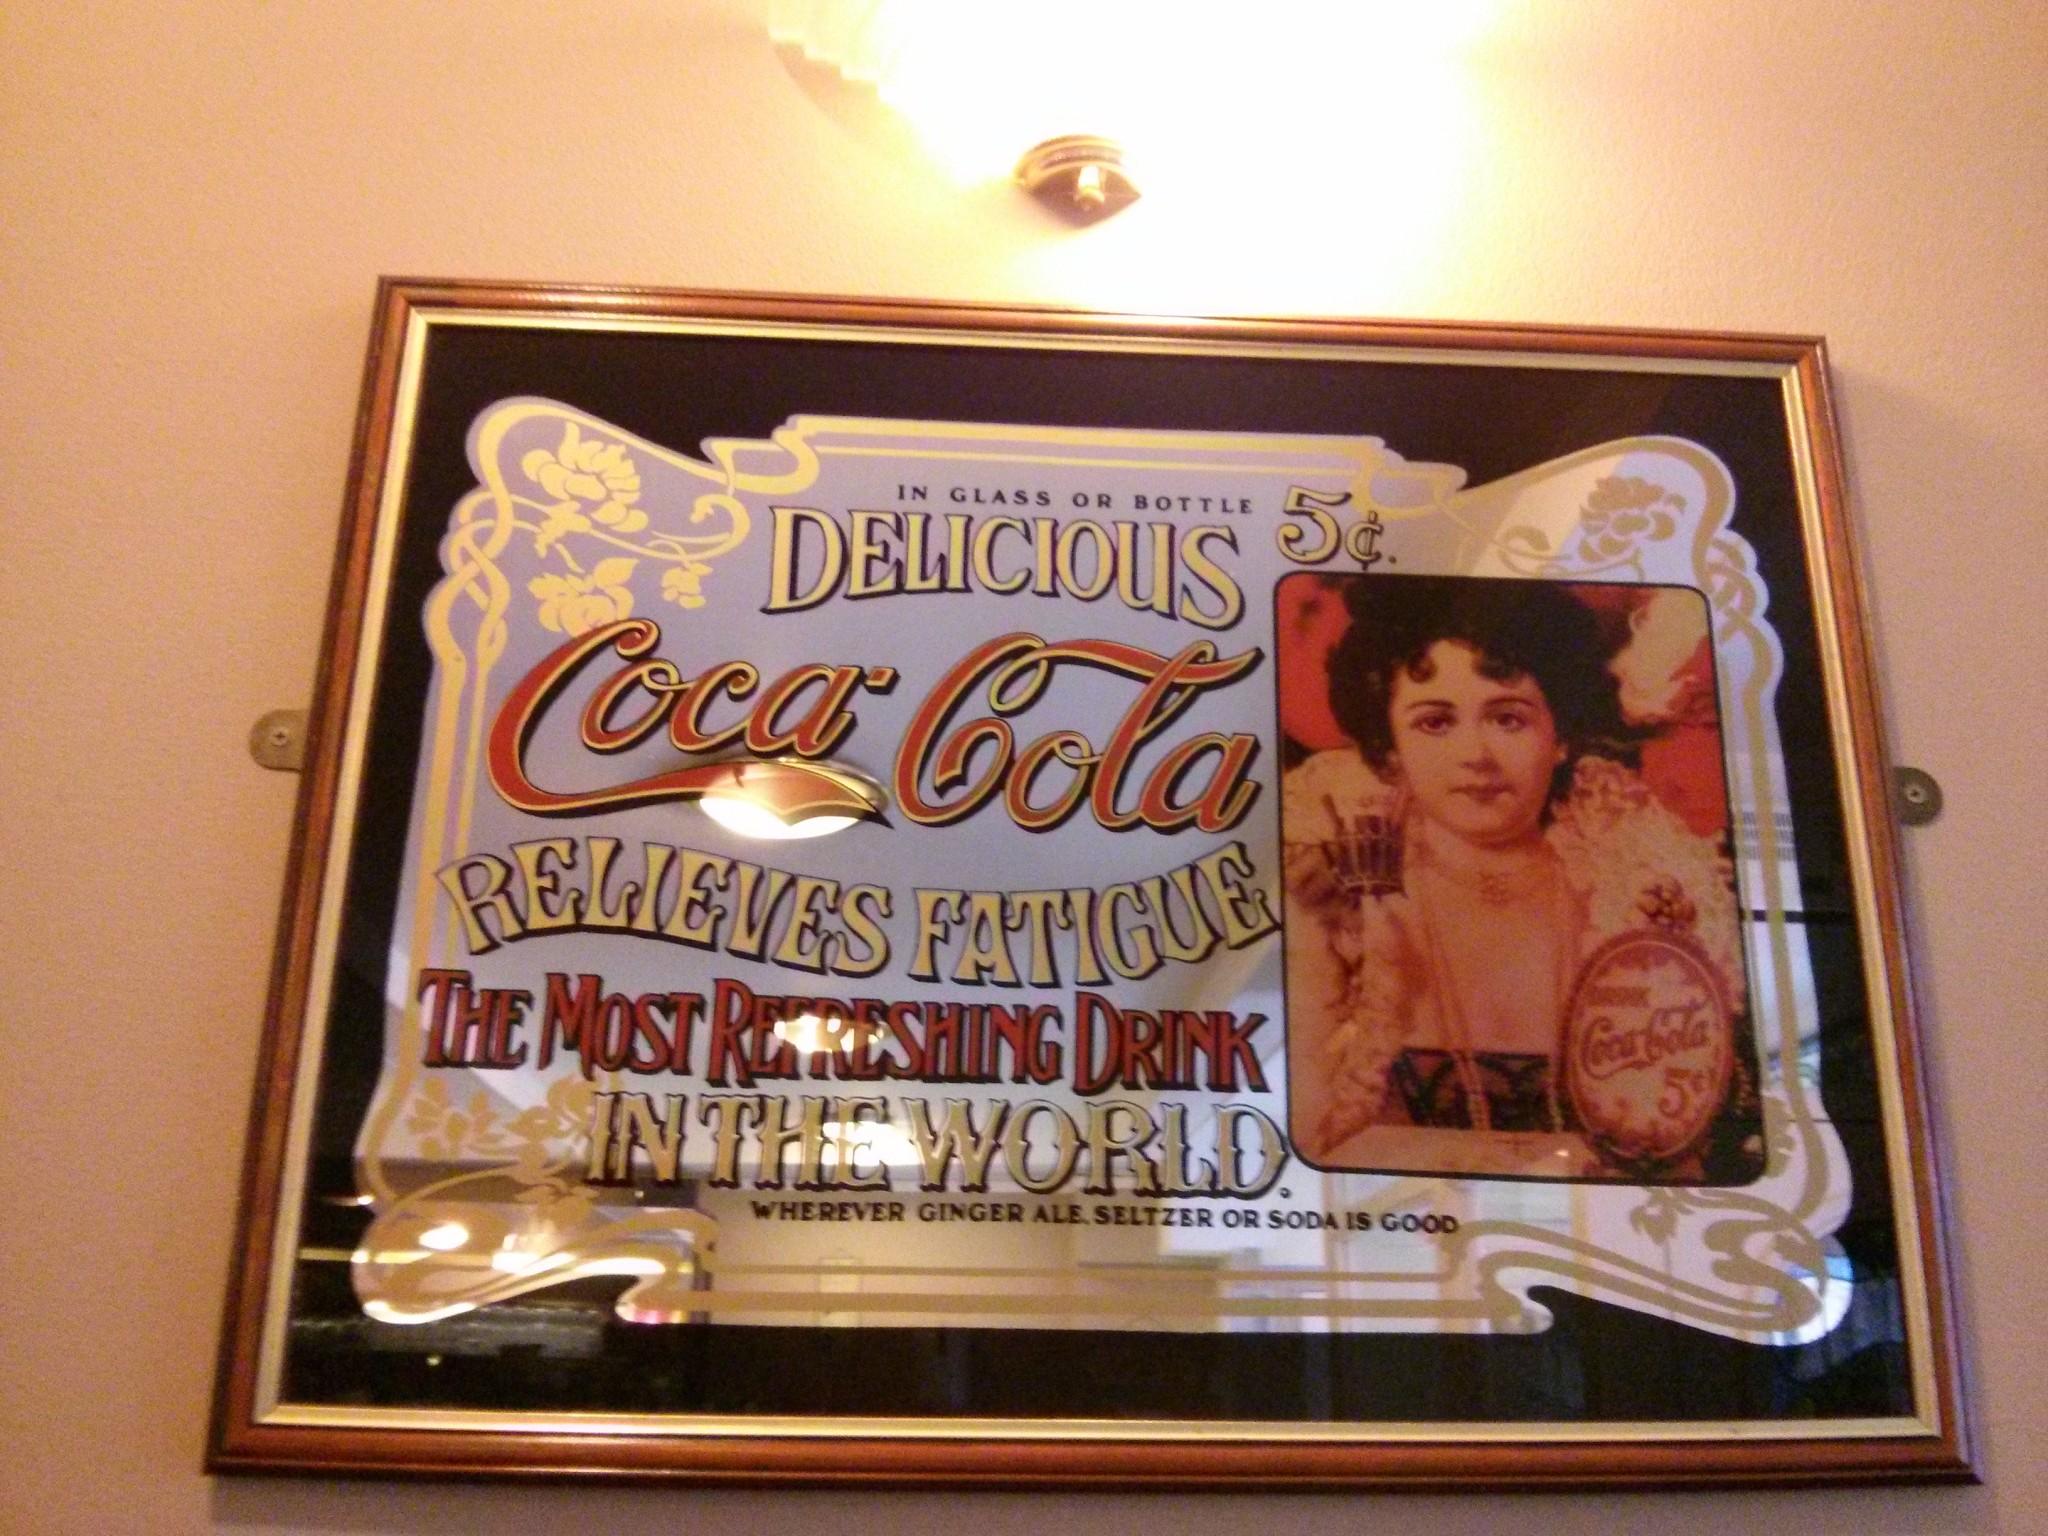 Old Coca Cola advertisement!